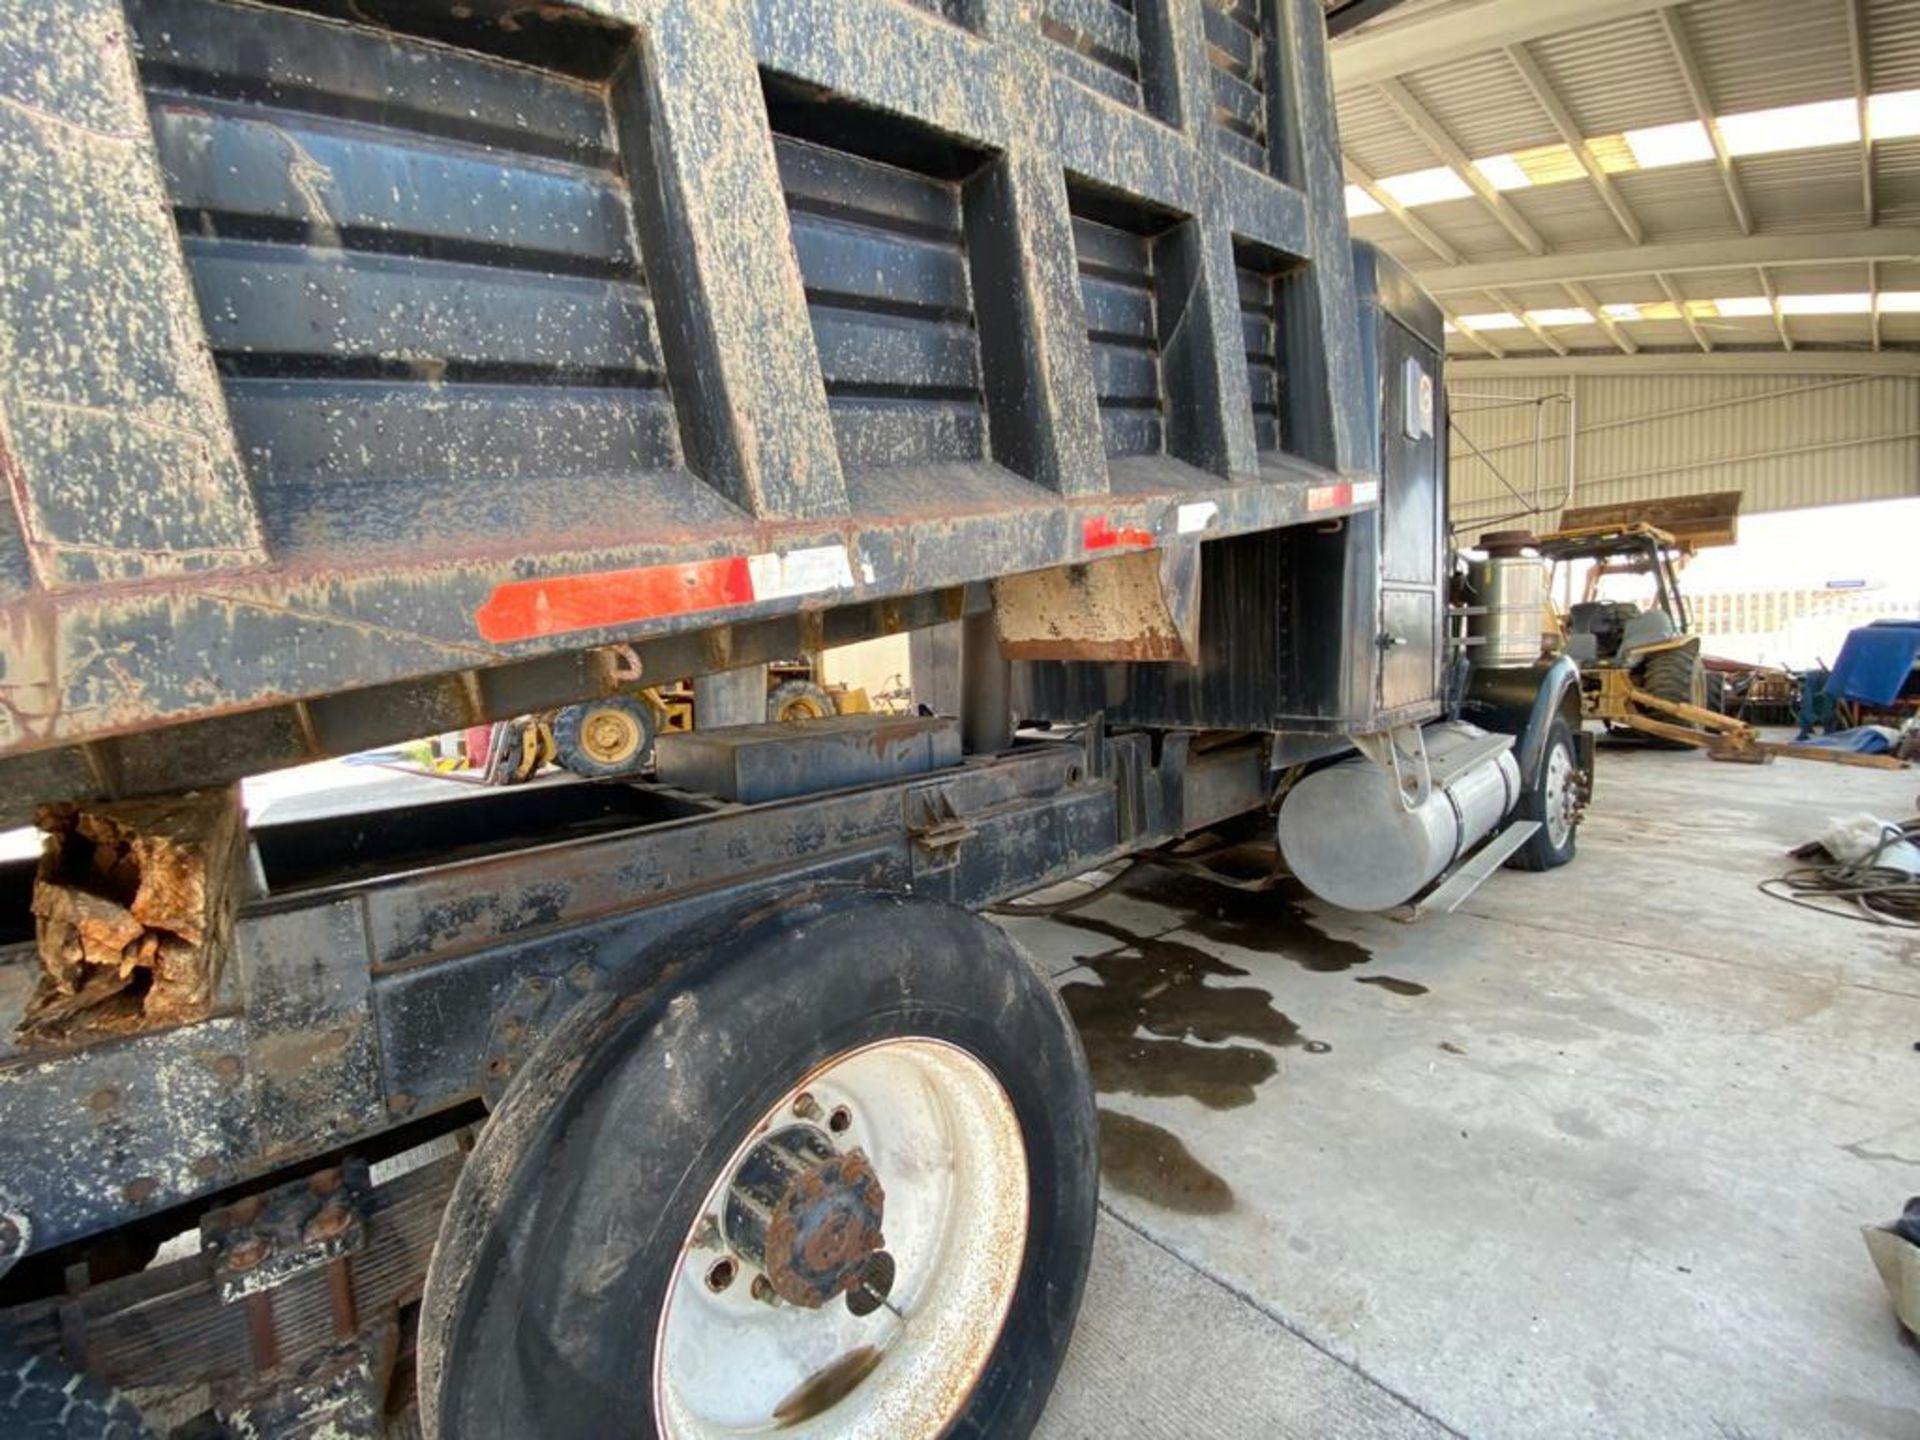 1983 Kenworth Dump Truck, standard transmission of 10 speeds, with Cummins motor - Image 66 of 68